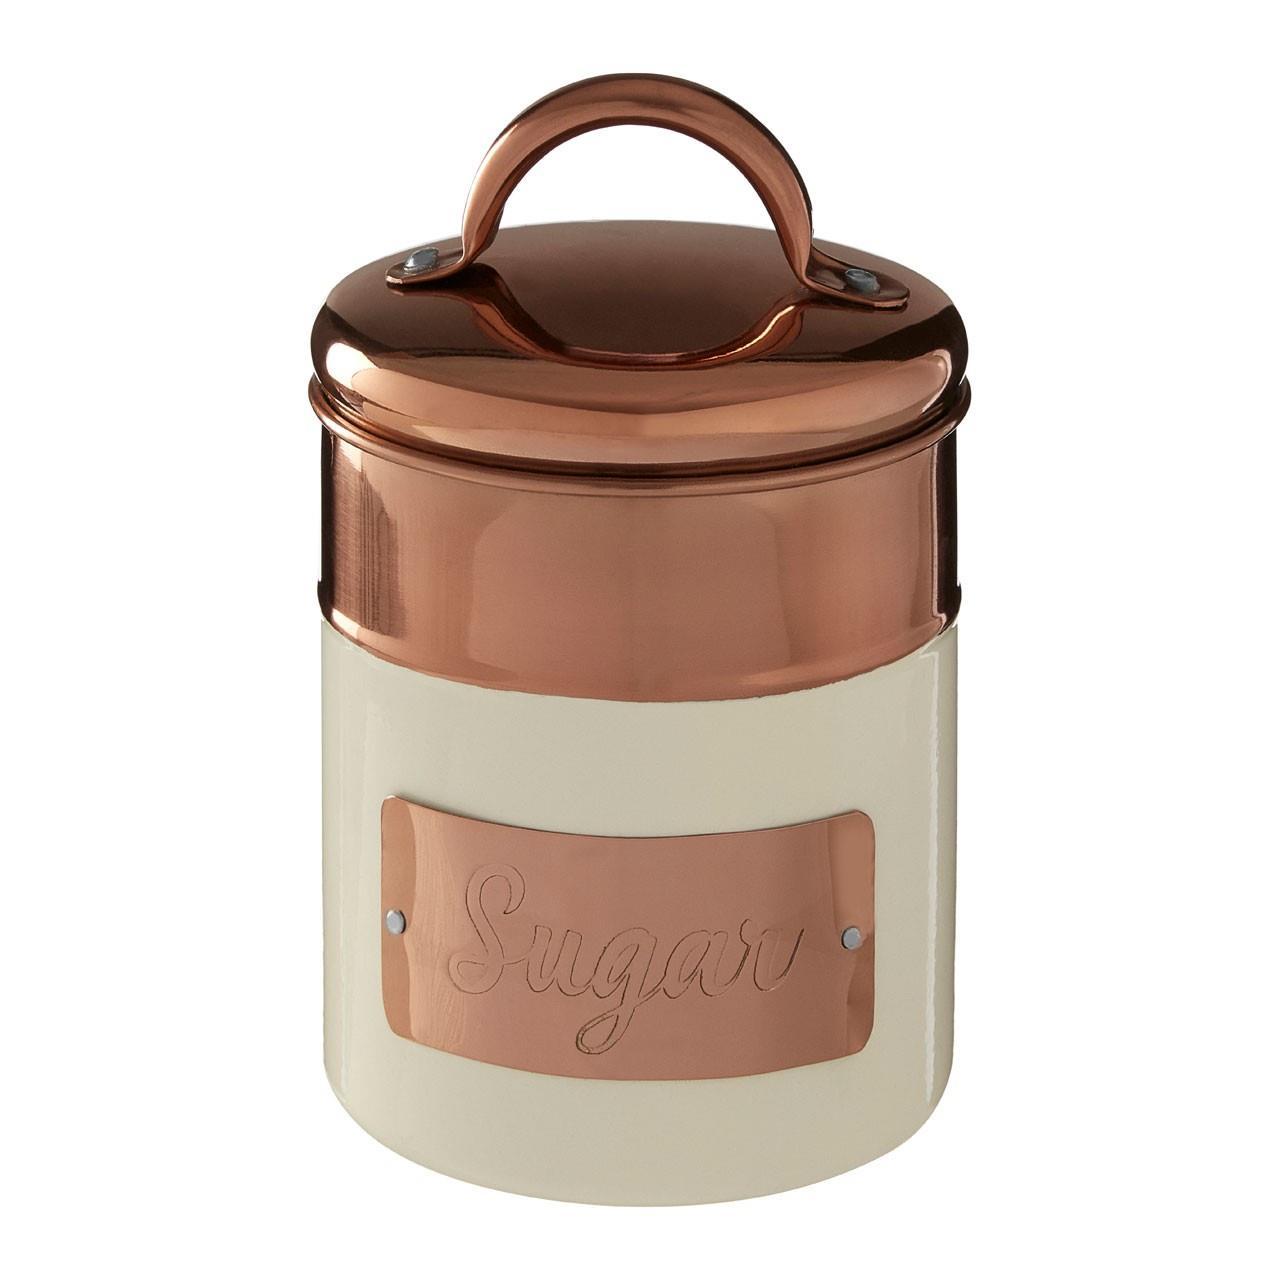 Prescott-Cream-Copper-Bread-Bin-Biscuit-Sugar-Coffee-Canister-Utensil-Holder thumbnail 12